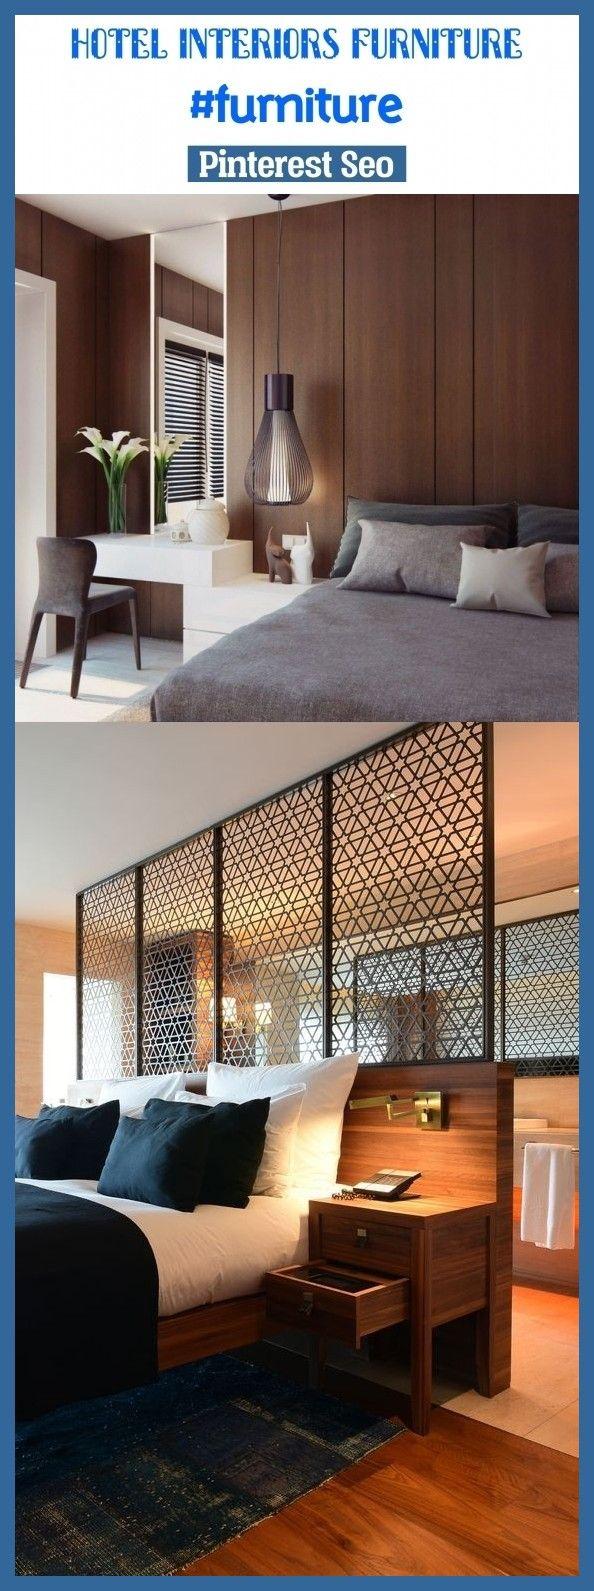 Hotel Room Furniture: Hotel Interiors Furniture #furniture #pinterestseo #seo